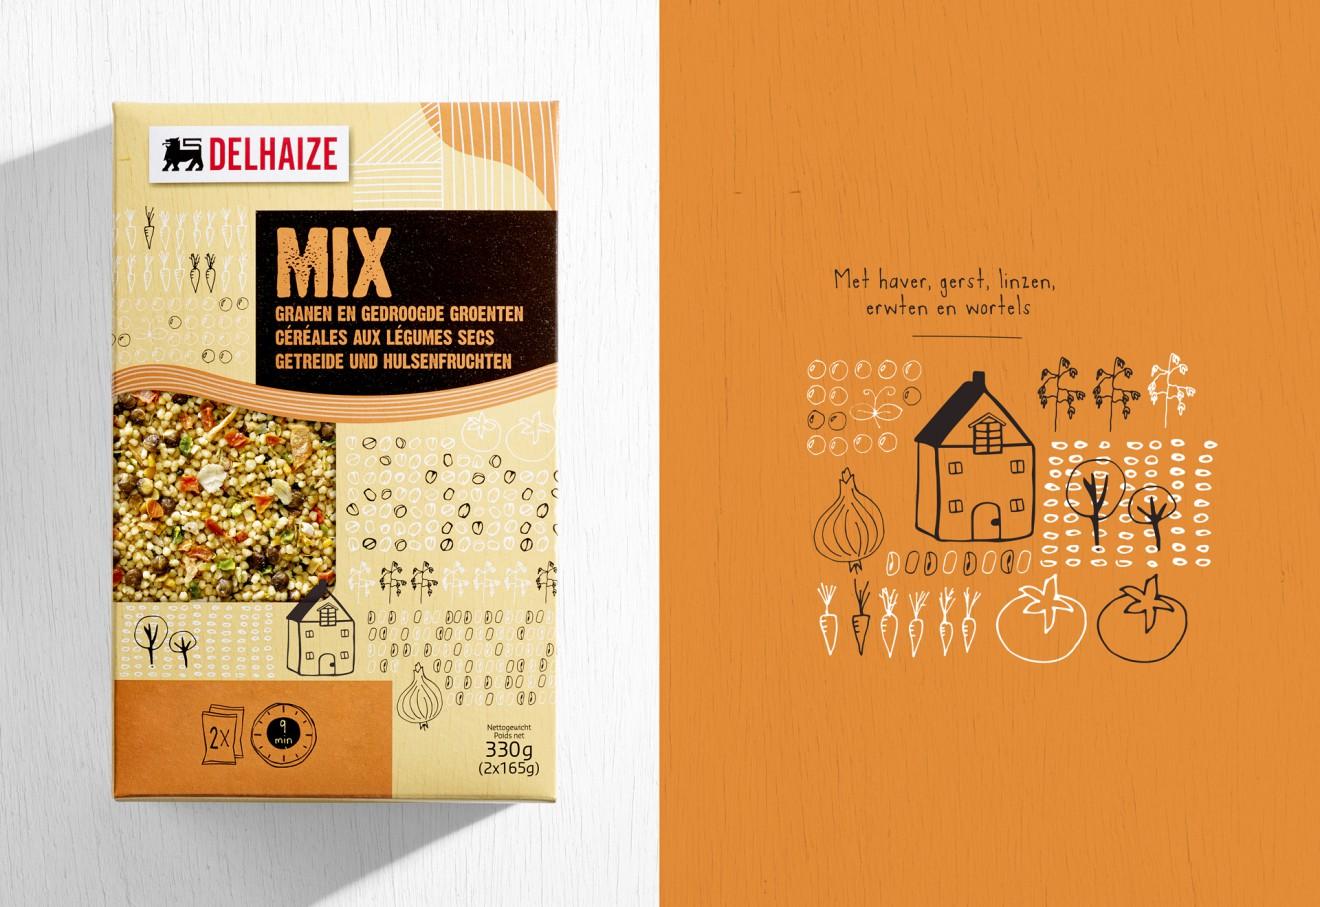 Quatre Mains package design - mix, gedroogde, groenten, haver, gerst, linzen